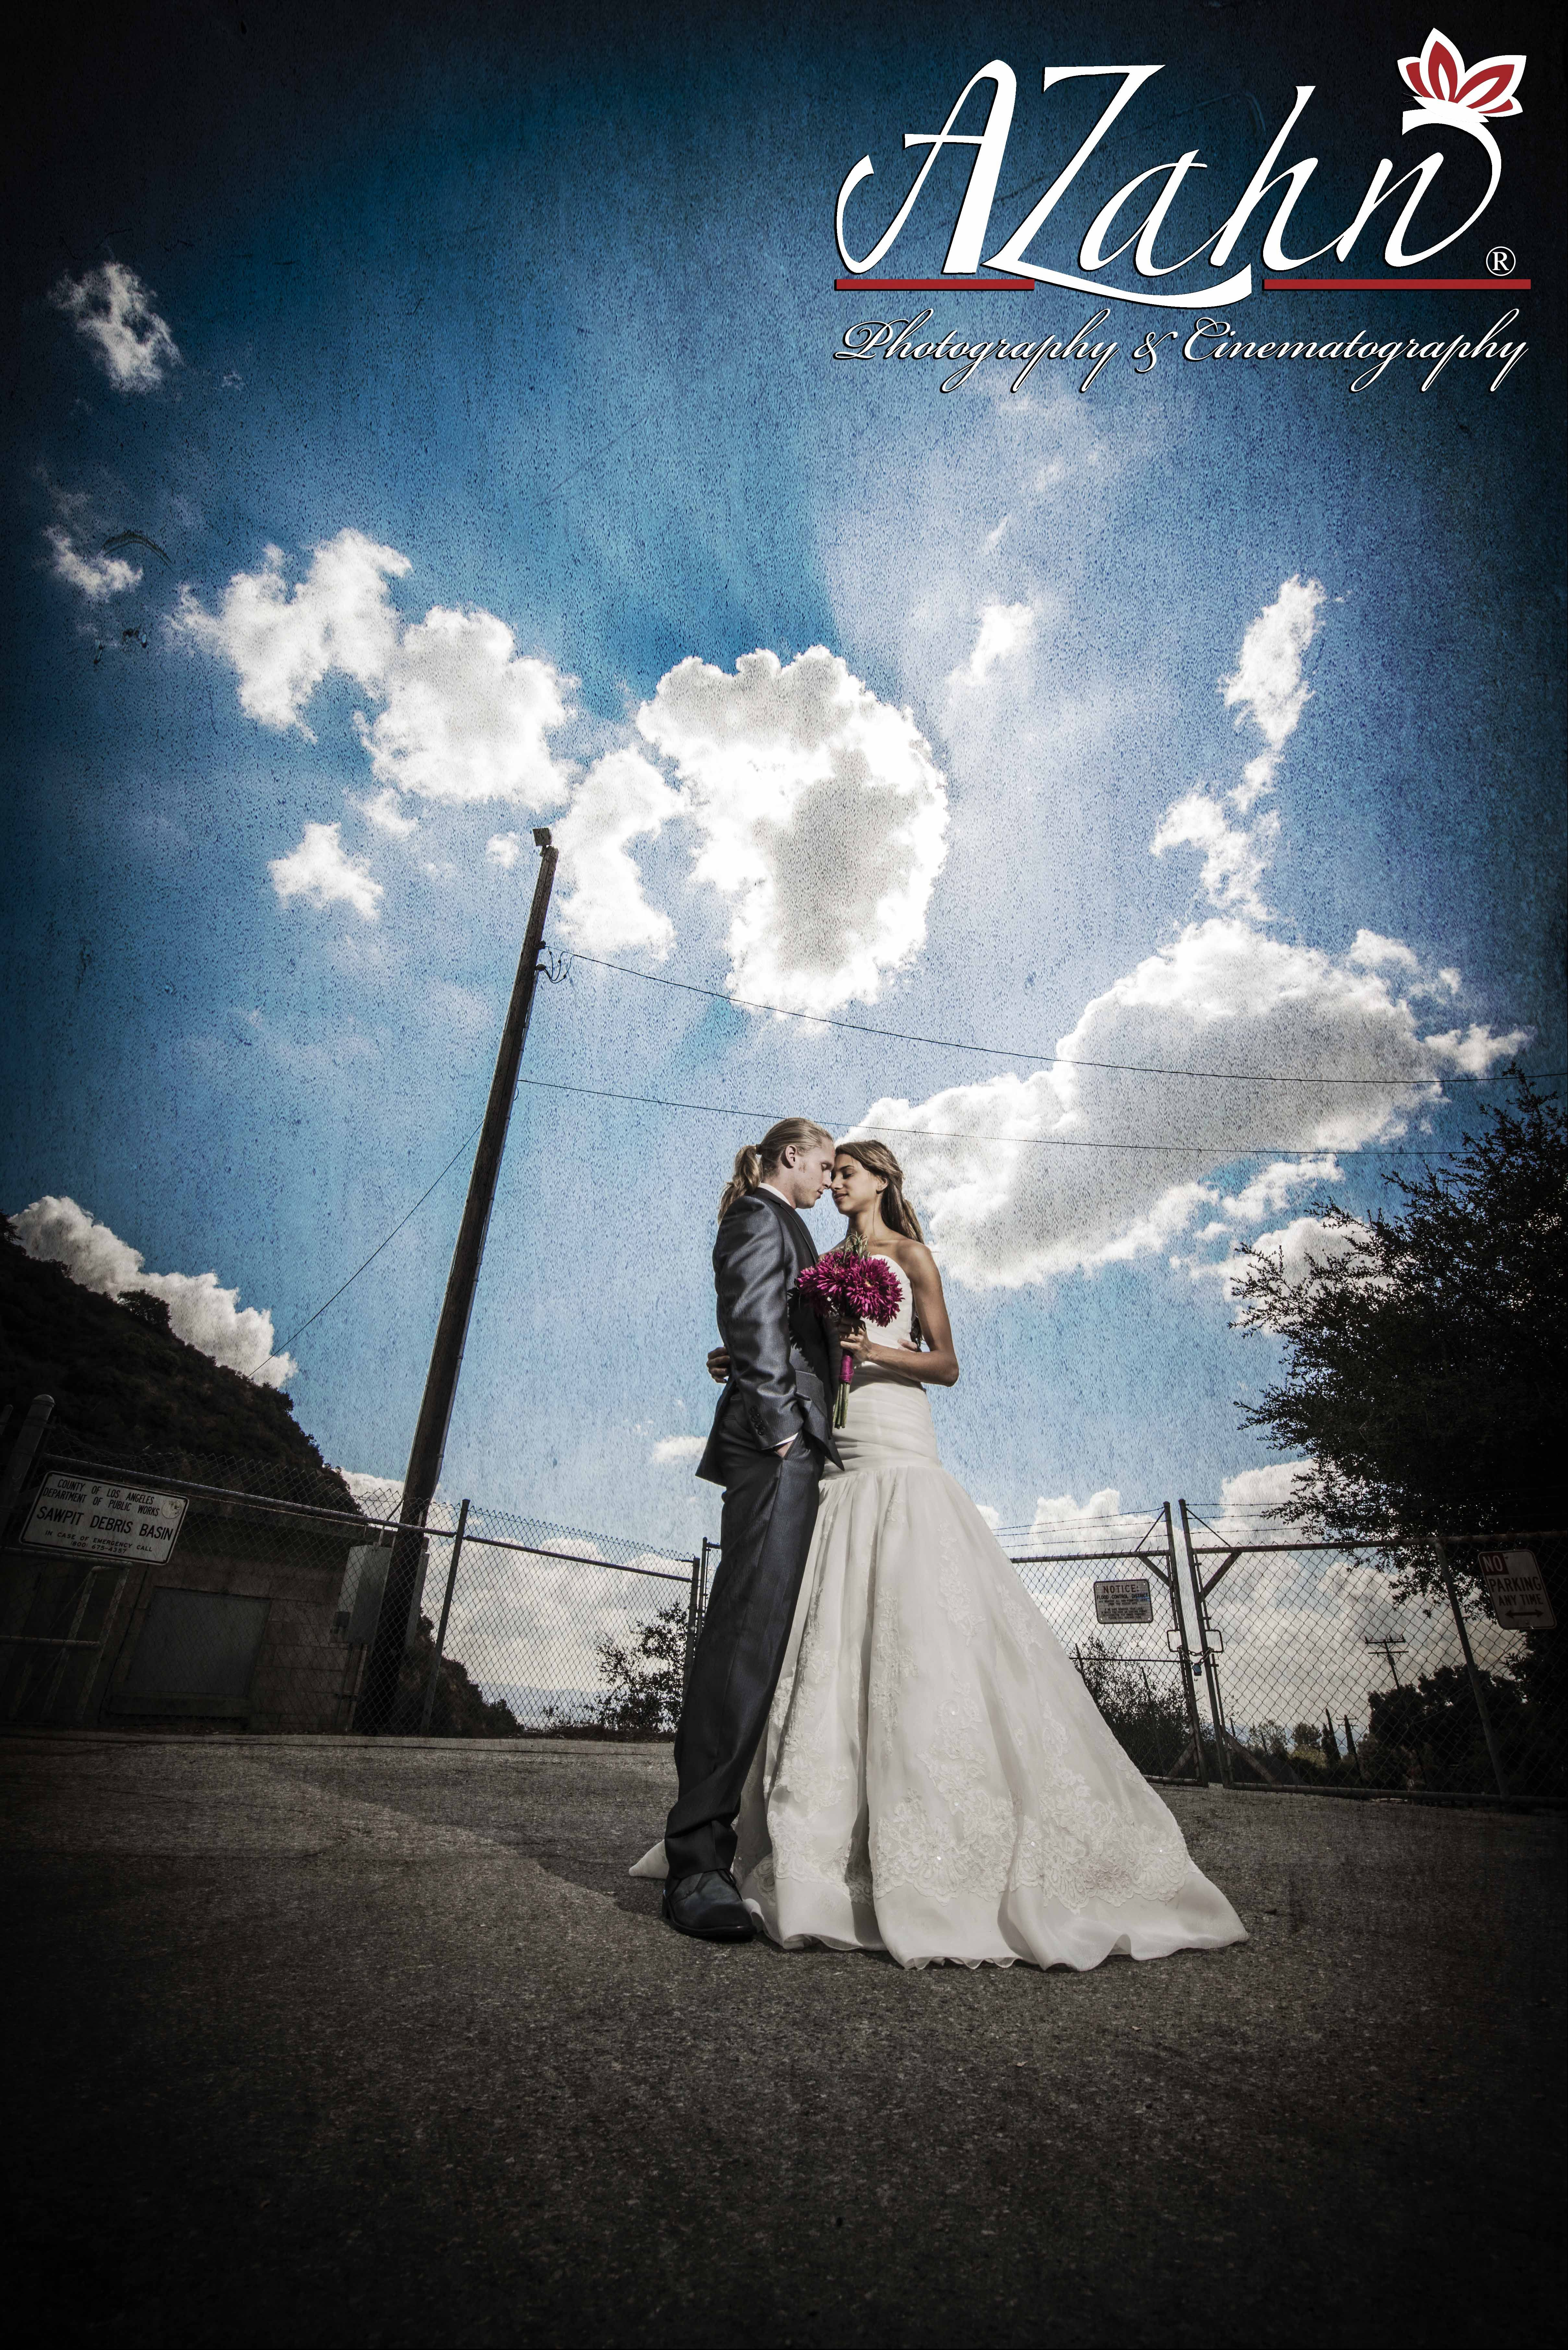 Trash the Dress, AZahn Photography & Cinematography, Wedding ...